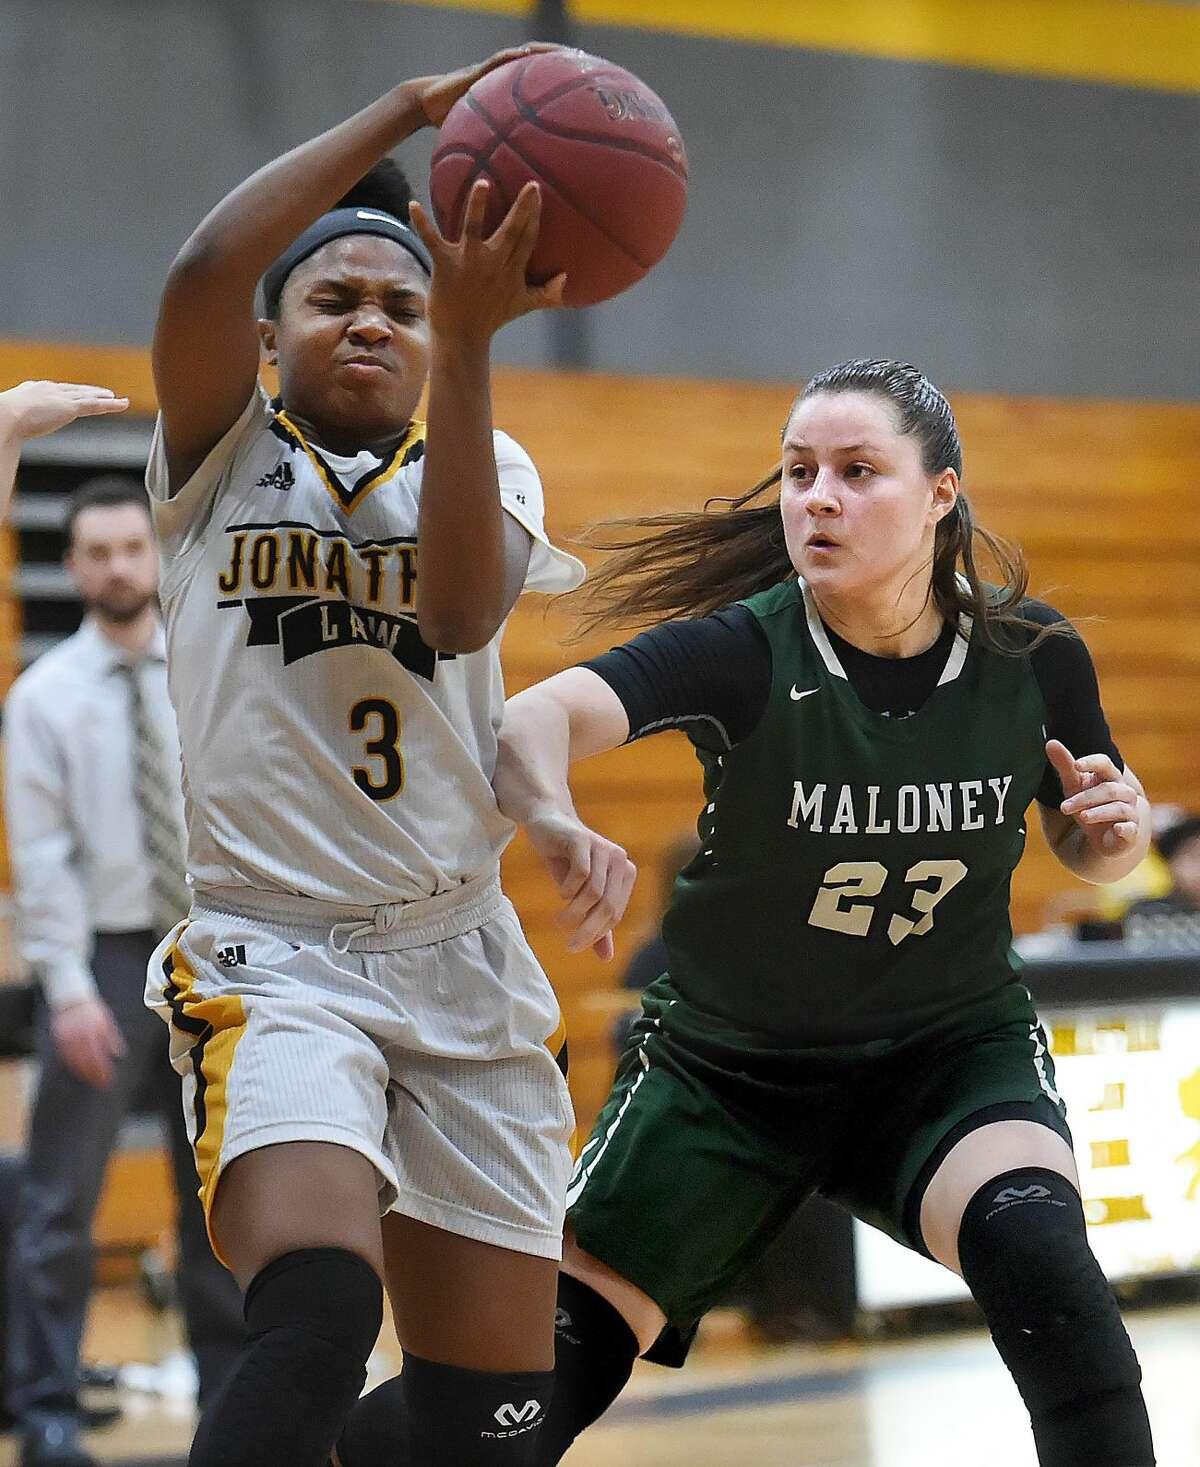 Law junior captain Samara Thacker makes a move on Maloney senior Melanie Polanco Tuesday, in a Class L first-round Game in Milford.